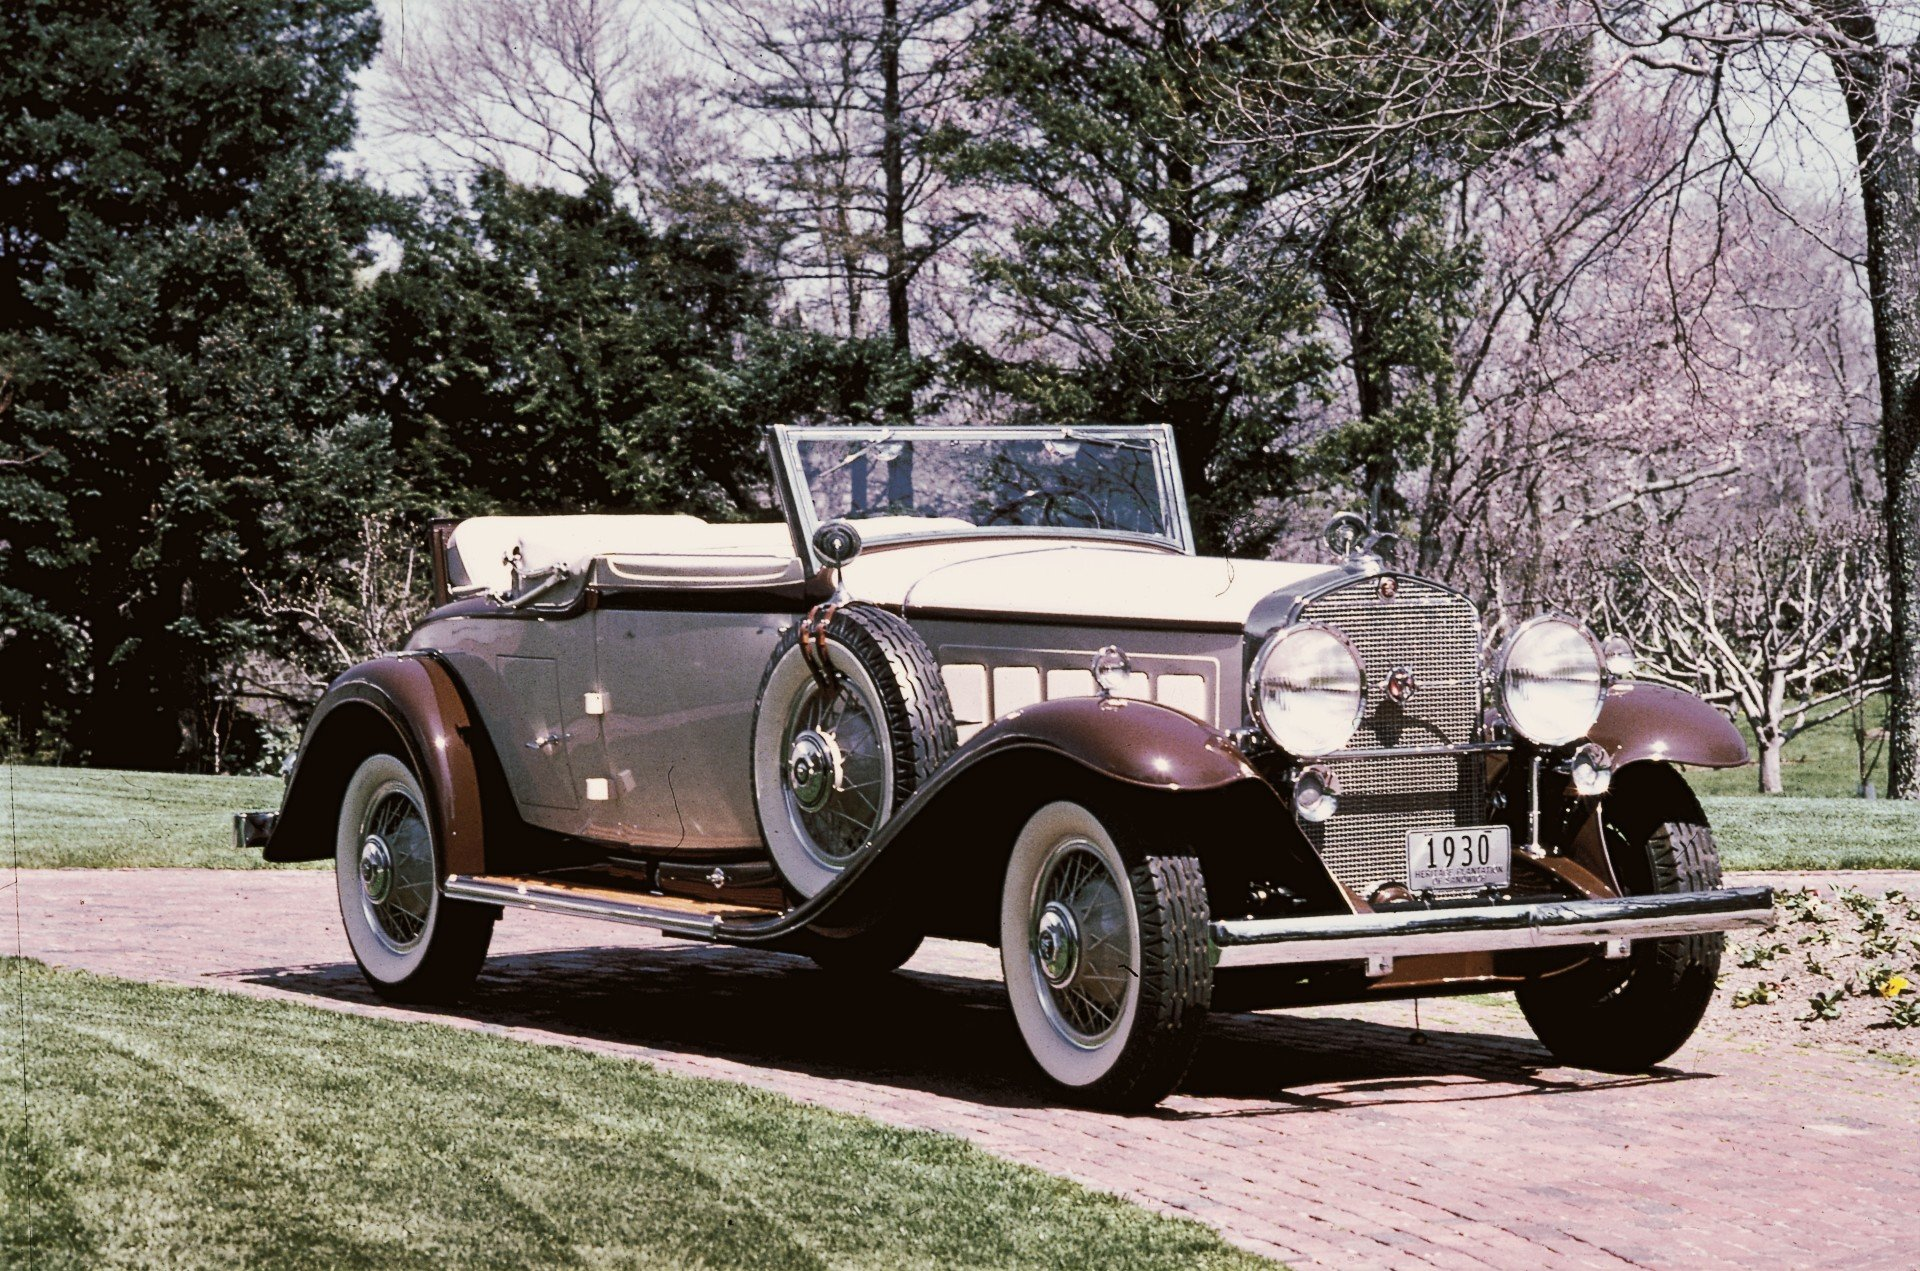 1930 Cadillac V-16 Convertible Coupe